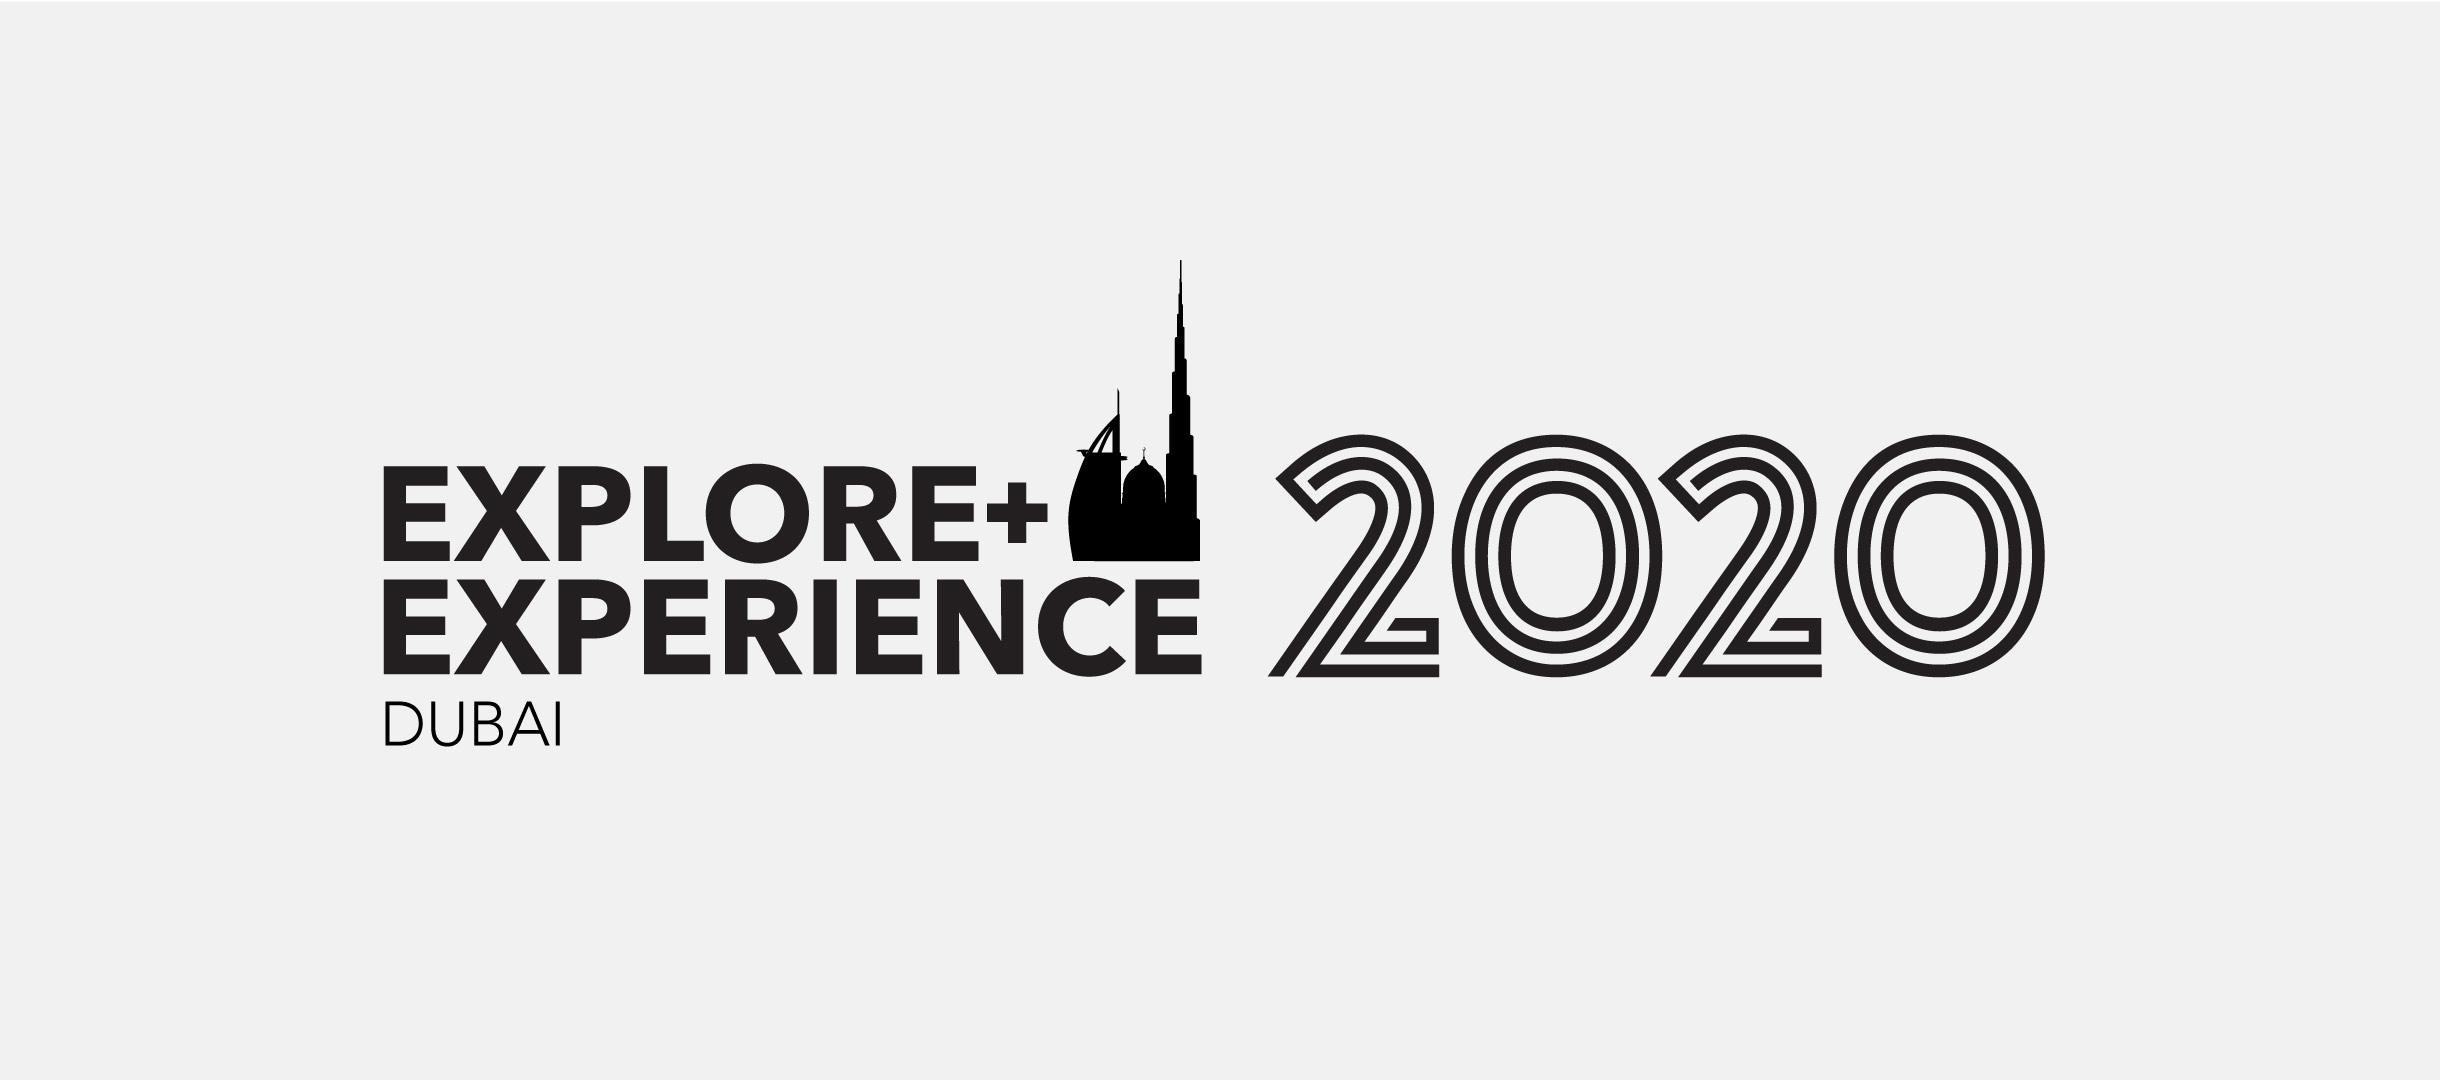 EE2020-Events-Dubai-2440px